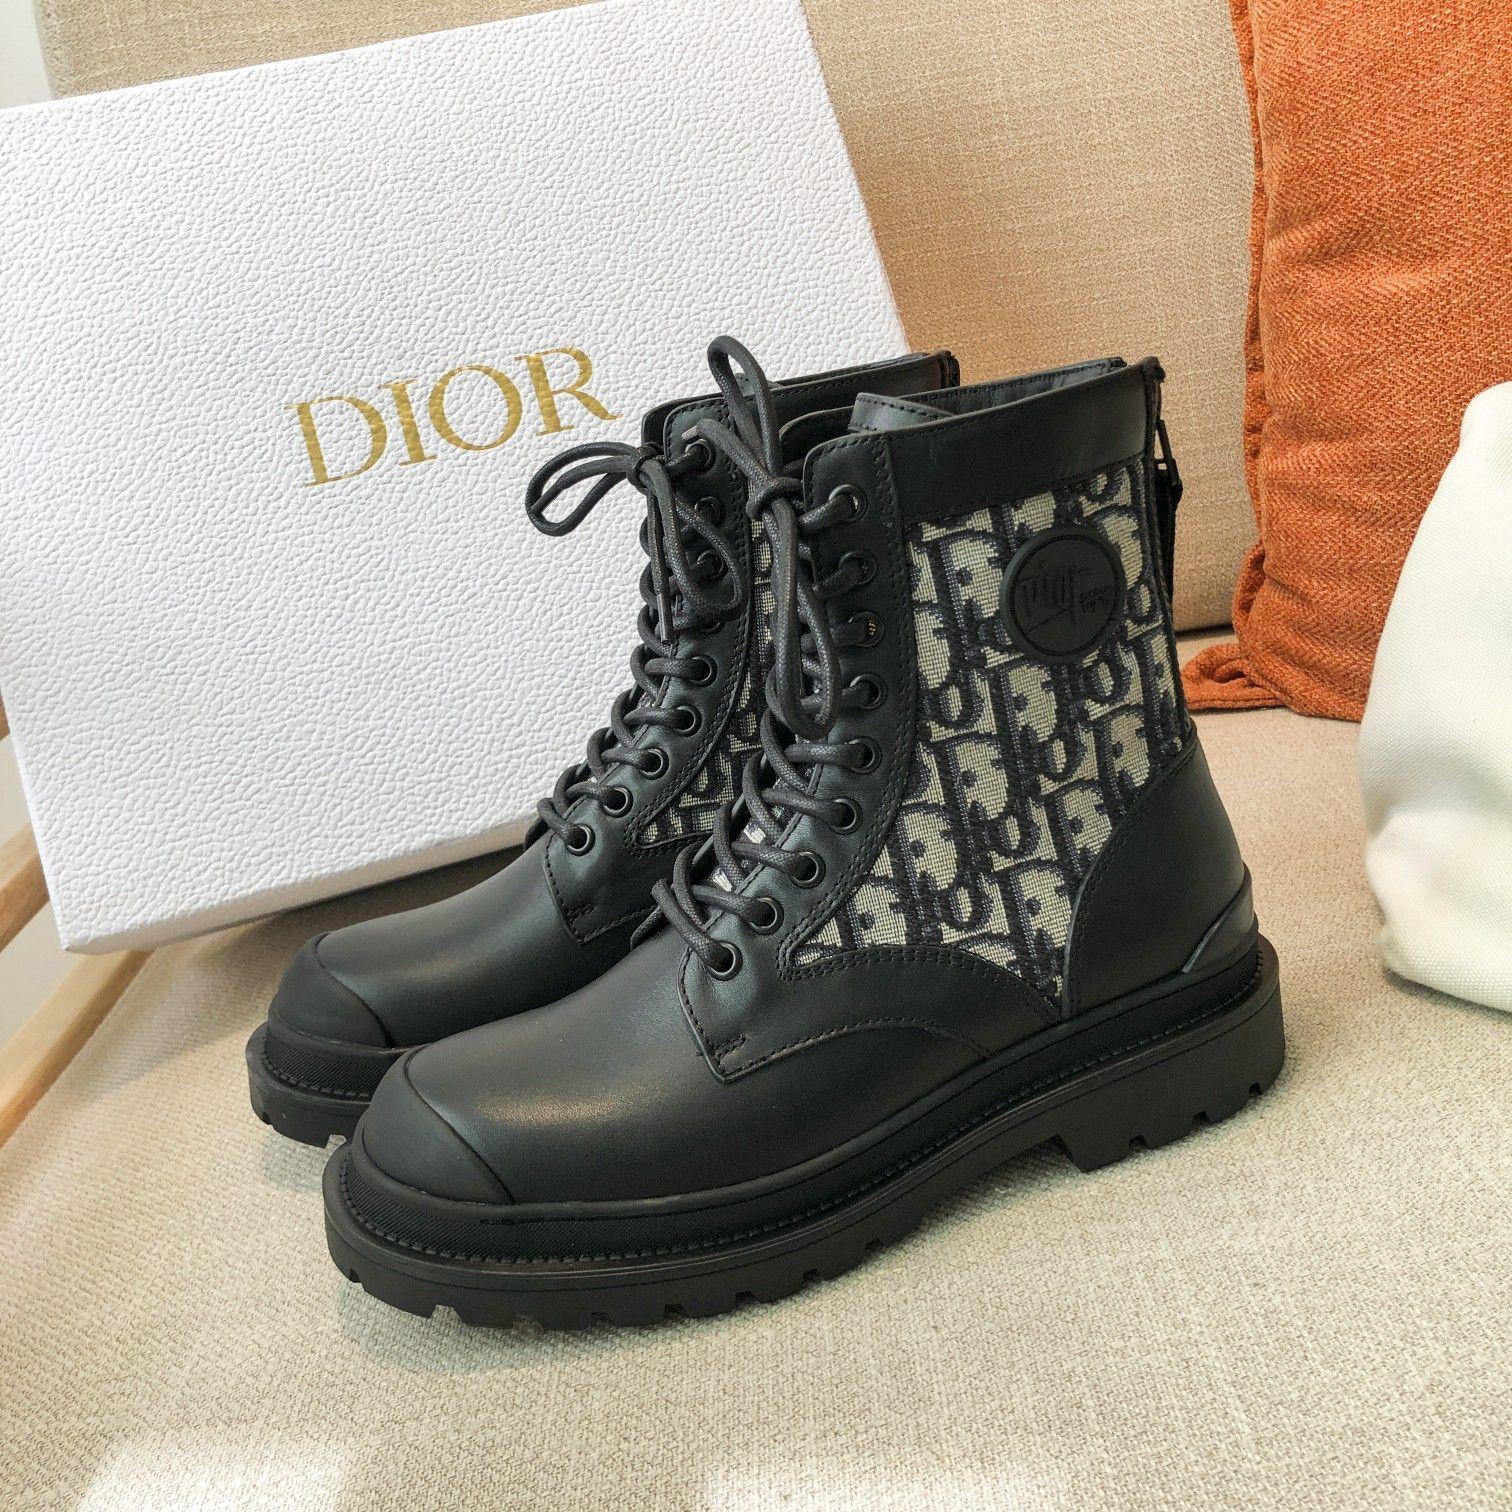 Dior高版本情侣 款2020ss秋冬新款字母厚底系带机车靴,秋冬T台走秀同款(图3)